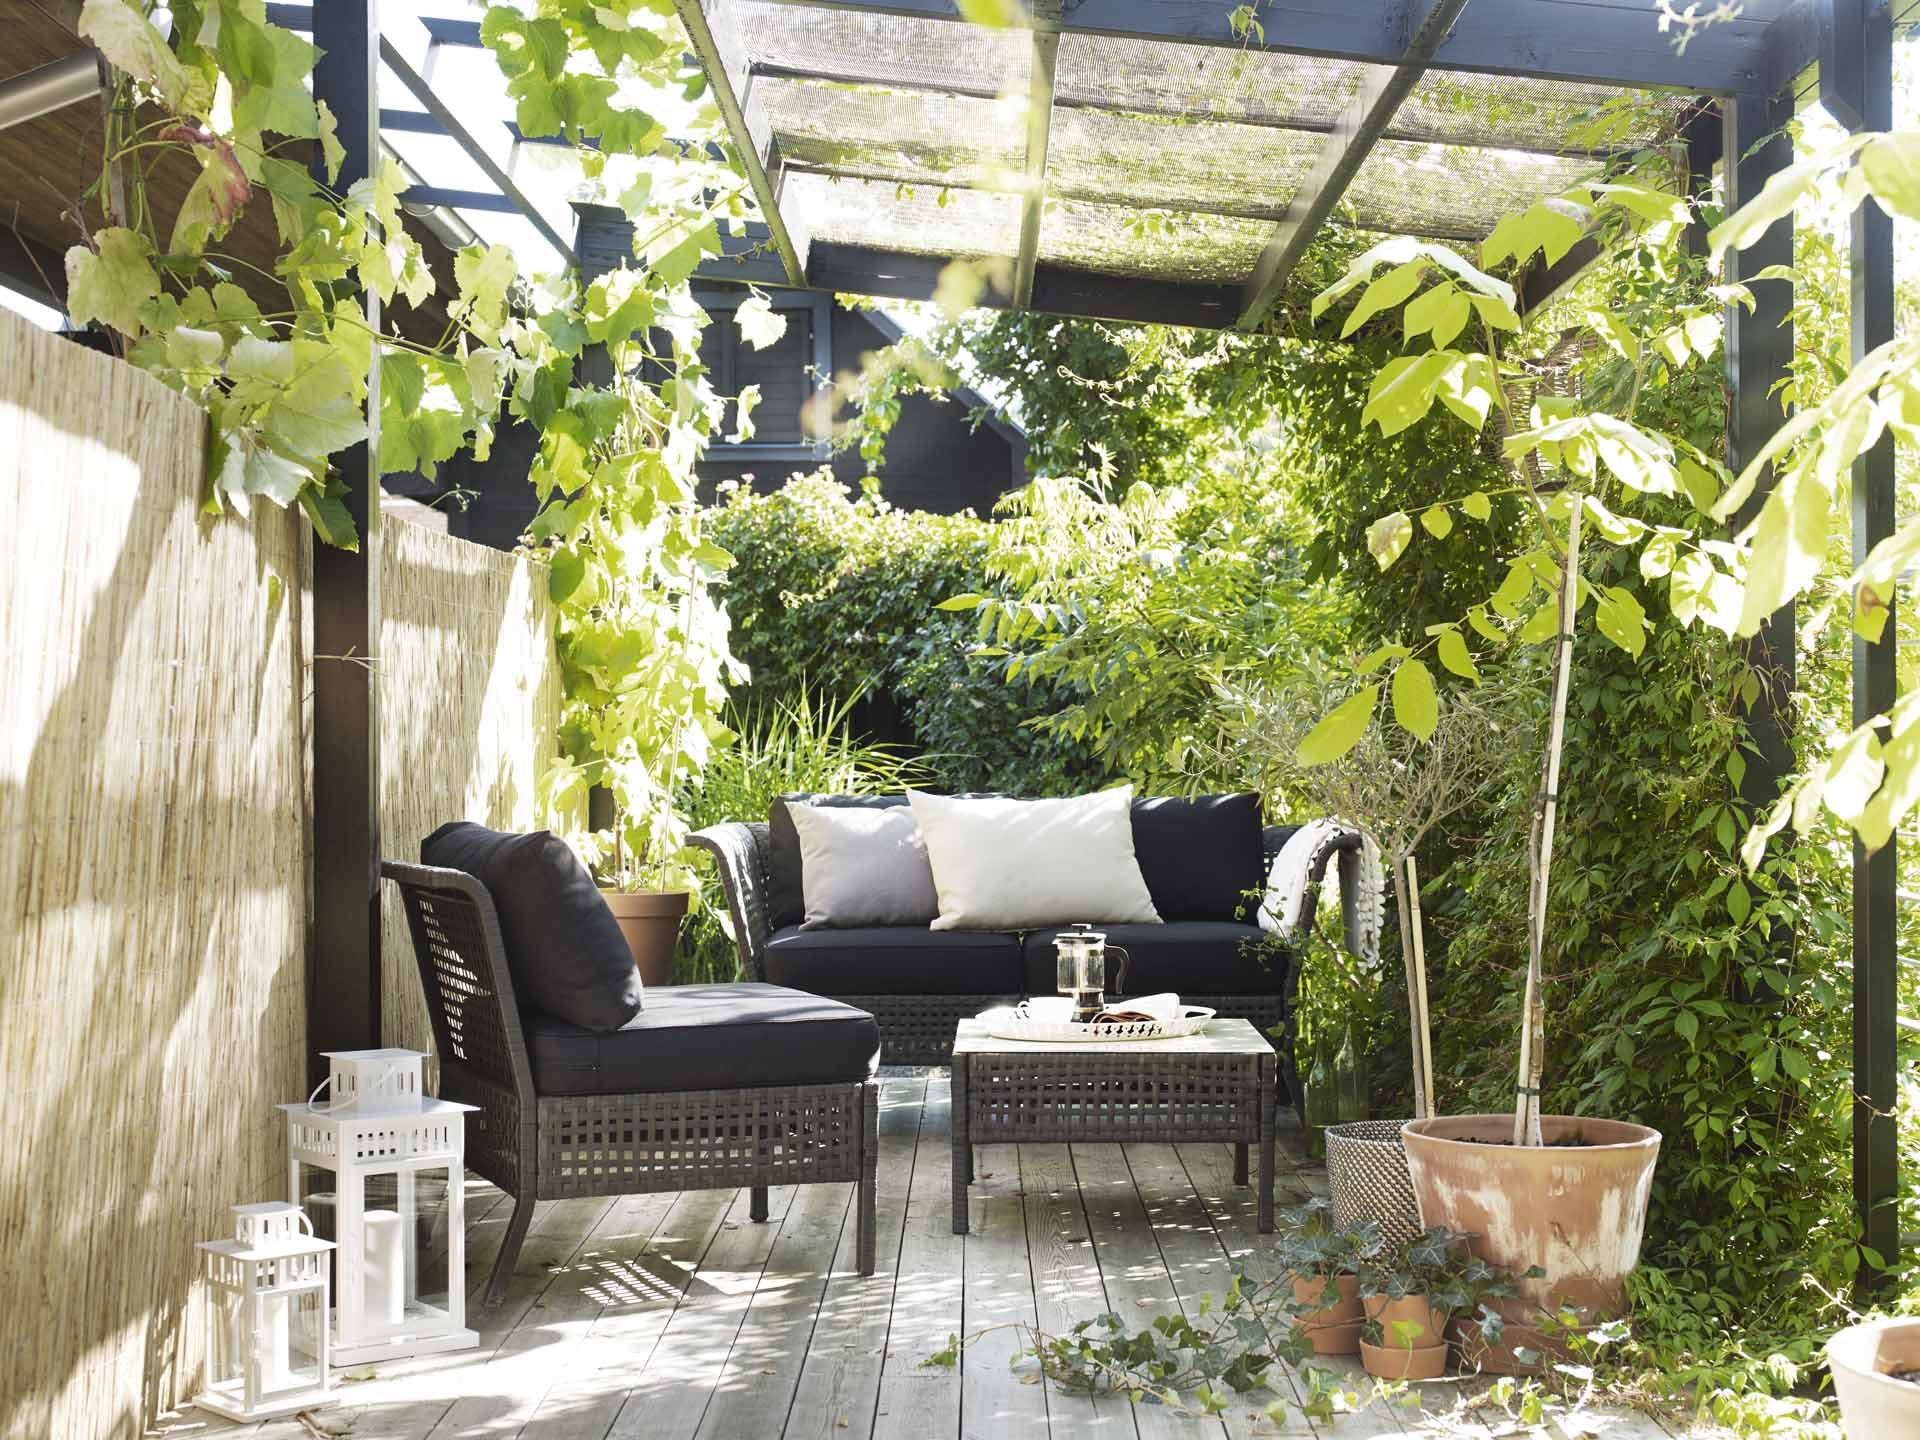 Epingle Sur Terrasse Et Jardin